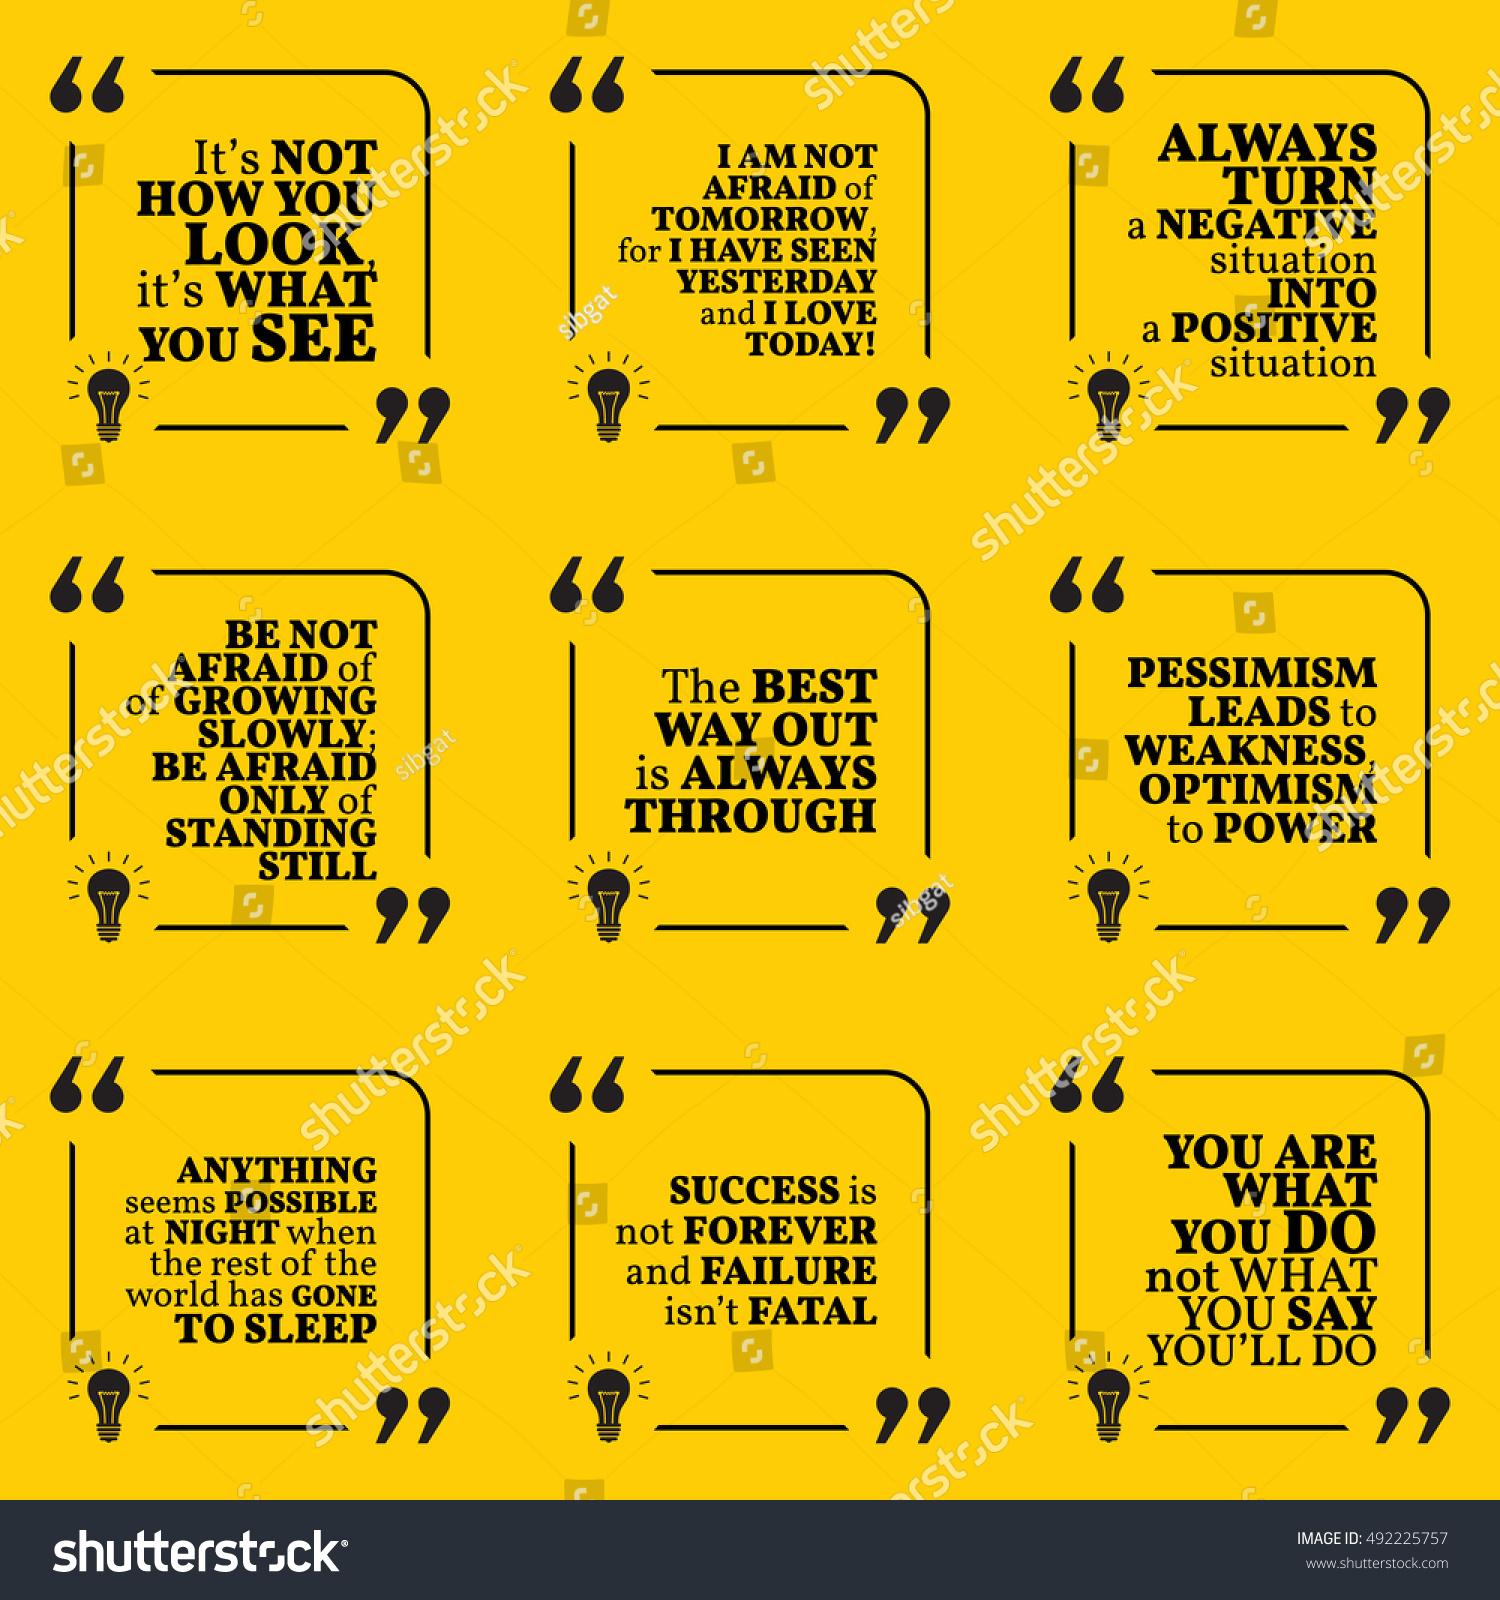 Quotes On Positive Thinking Set Motivational Quotes About Positive Thinking Stock Vector